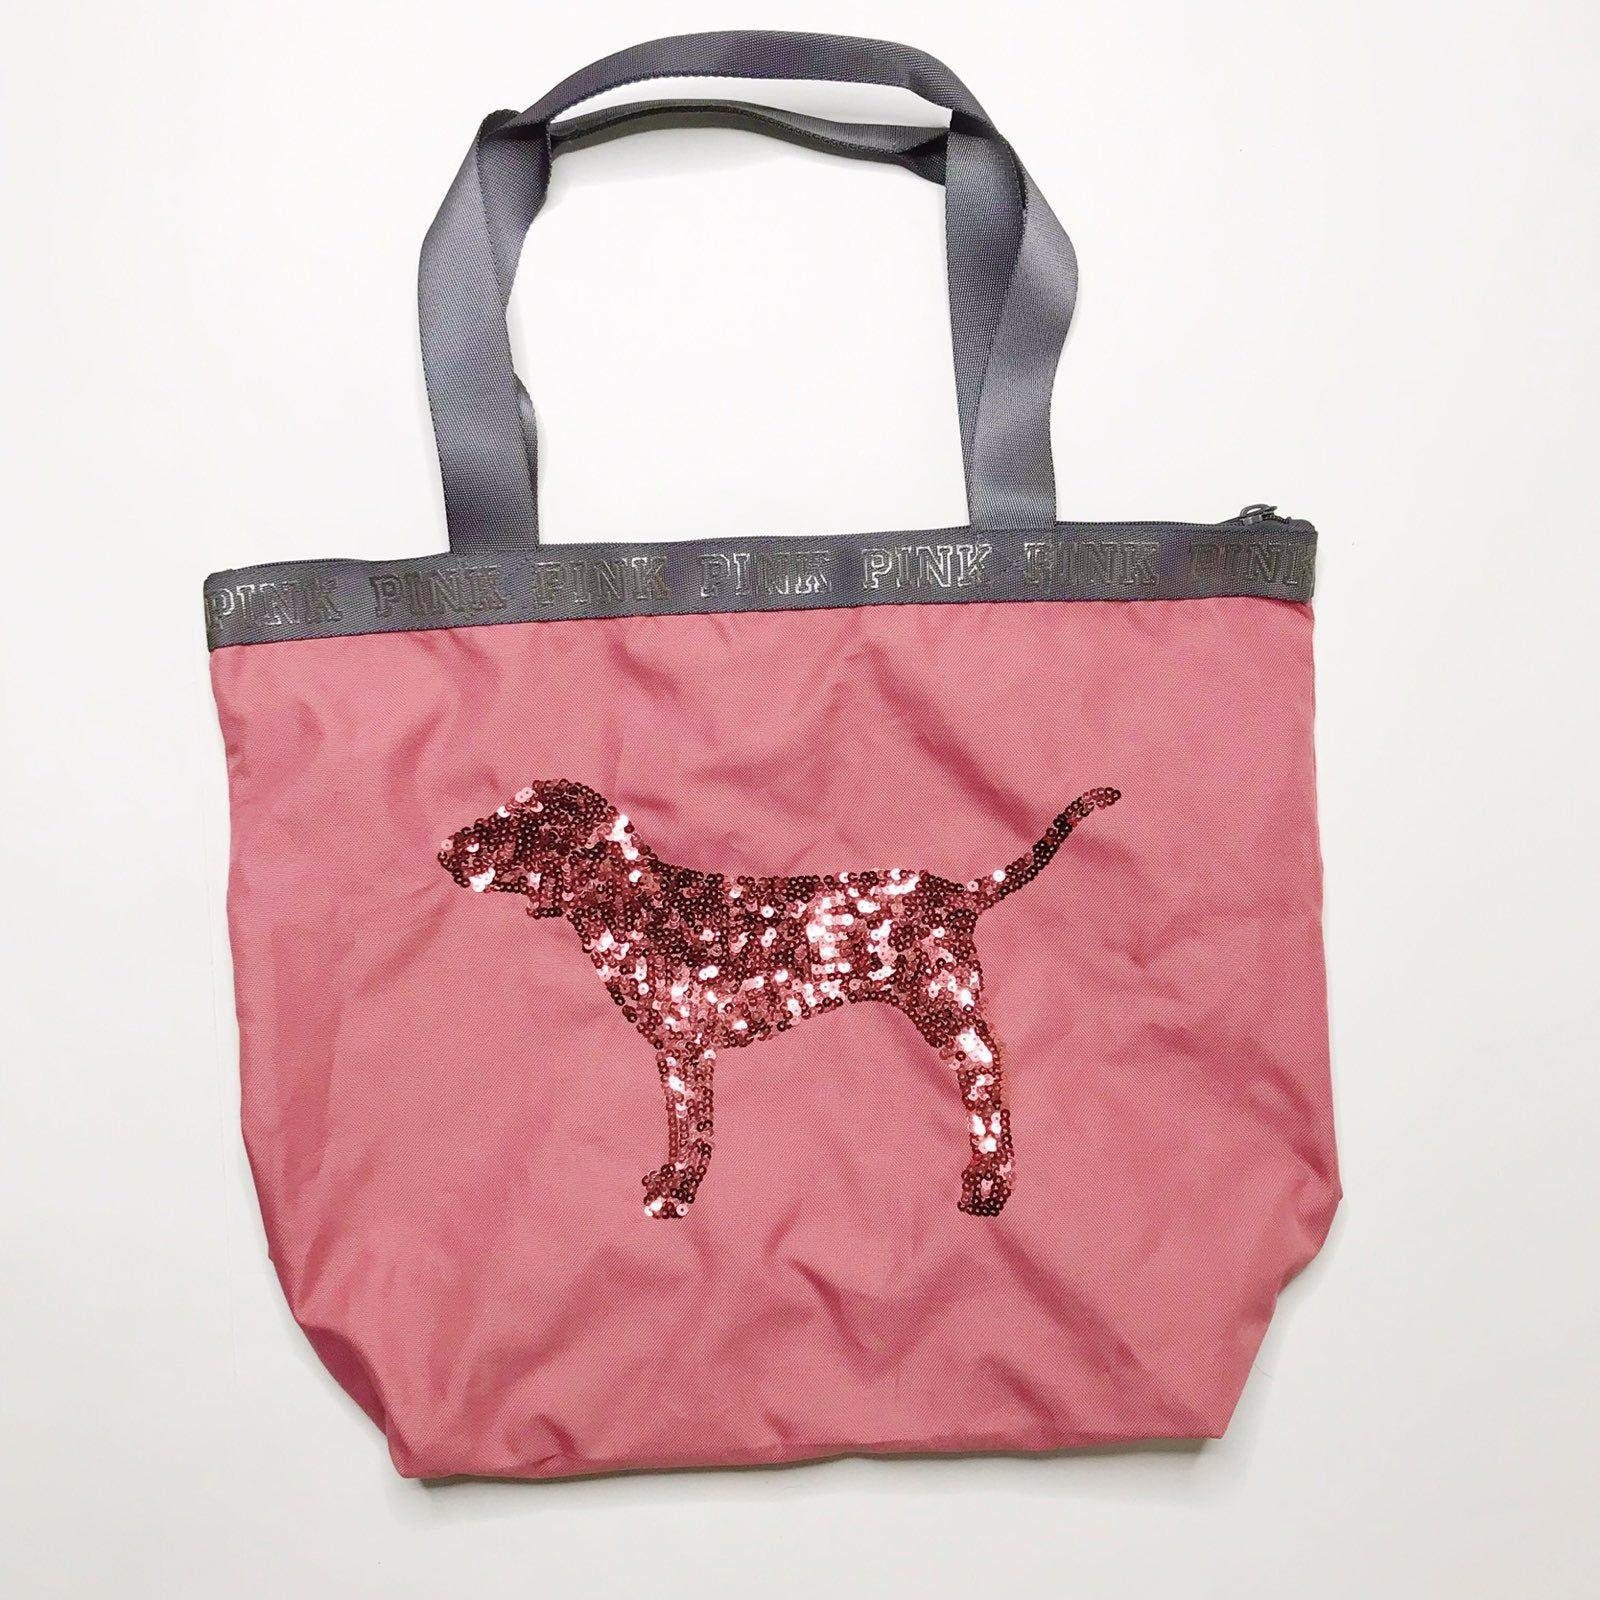 Victoria Secret PINK Large Tote Bag on Mercari